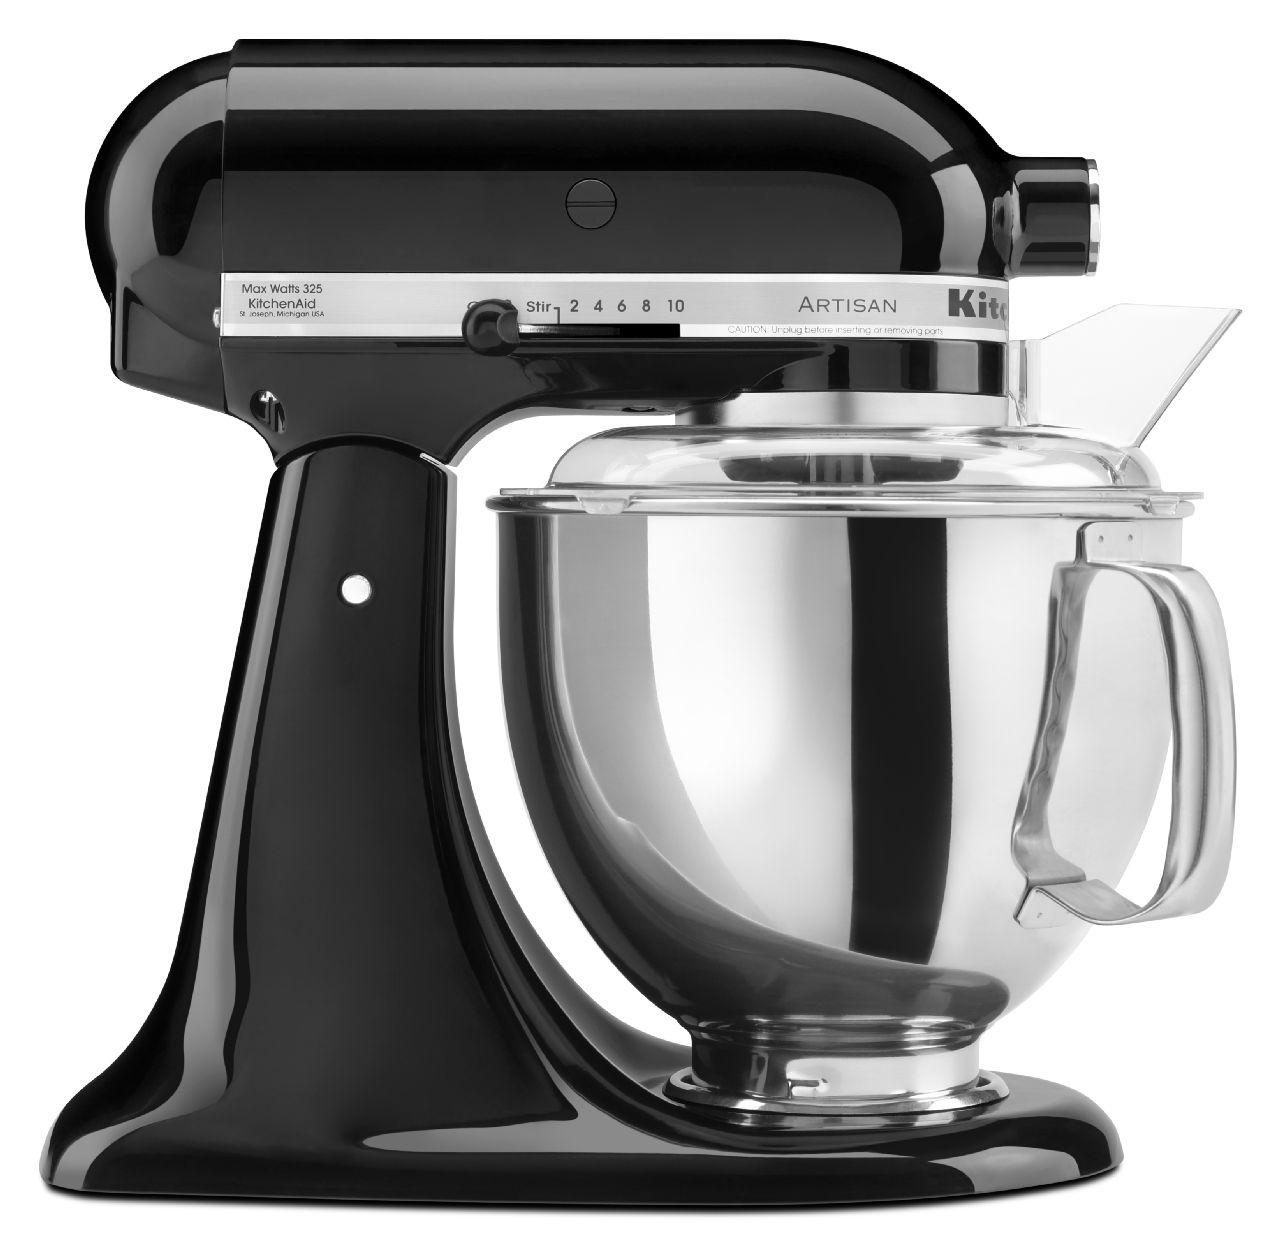 KitchenAid-Artisan-Series-5-Quart-Tilt-Head-Stand-Mixer-10-Speeds-KSM150PS thumbnail 95